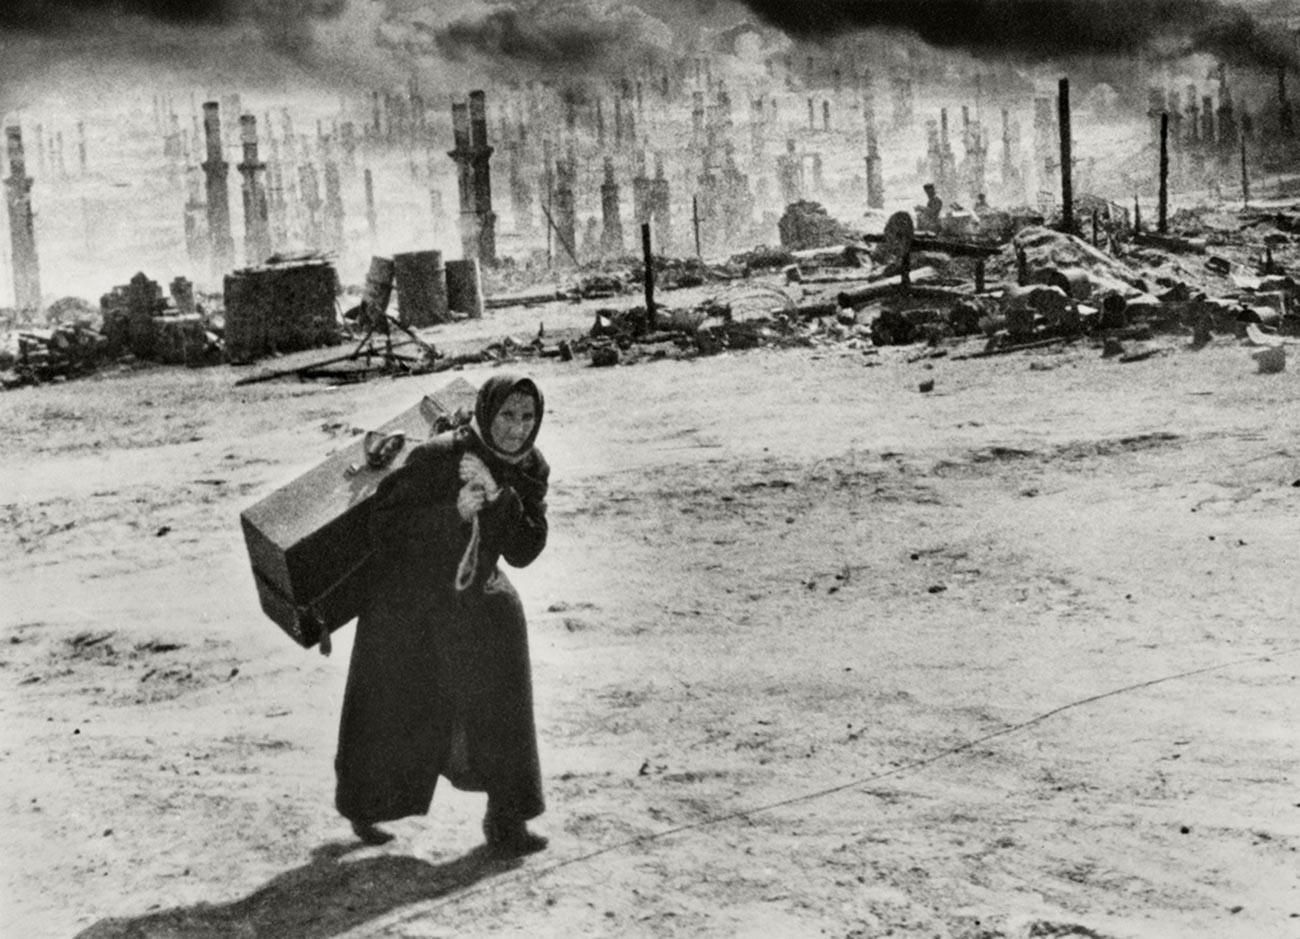 """El éxodo"", tras el bombardeo nazi de Múrmansk"